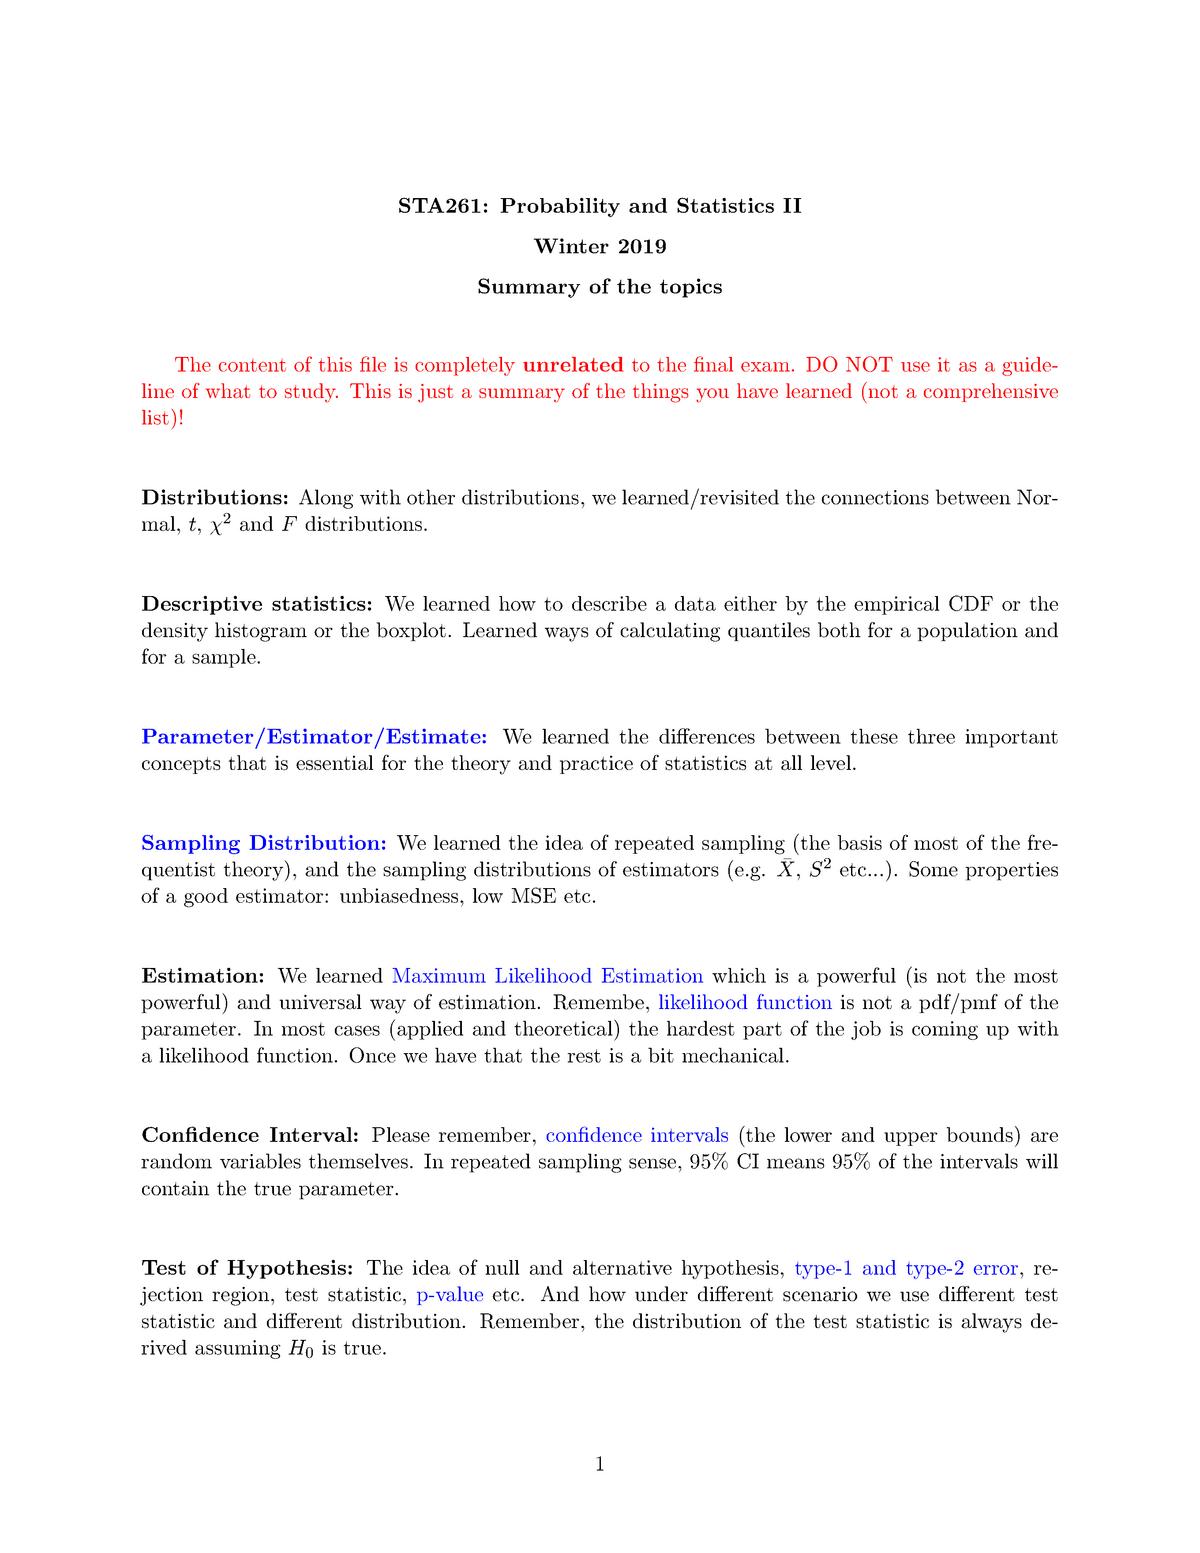 Summary - Probability and Statistics II Sta261H1 - StuDocu